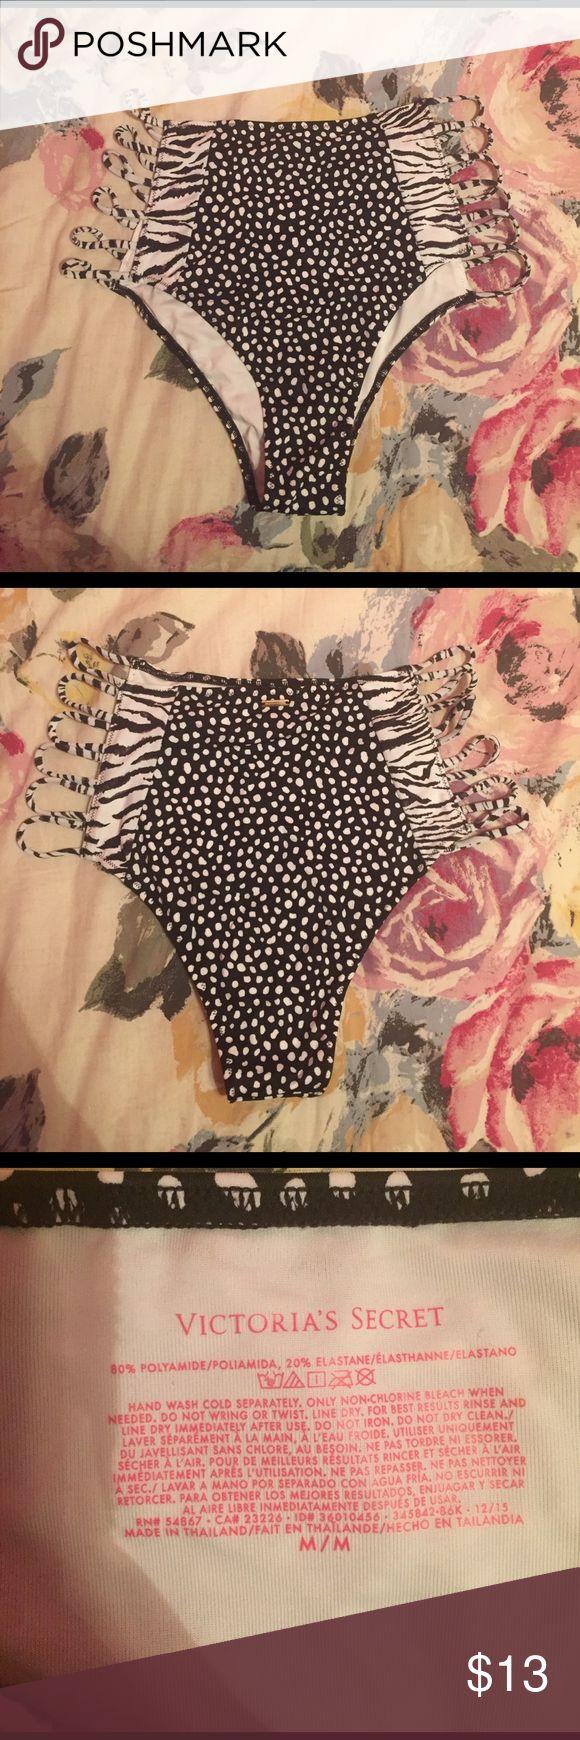 High waisted Polka dot Zebra bikini 👙 Really cute high waisted cheeky bikini that's easy to mix and match. Brand new, never worn, only tried on. Victoria's Secret Swim Bikinis